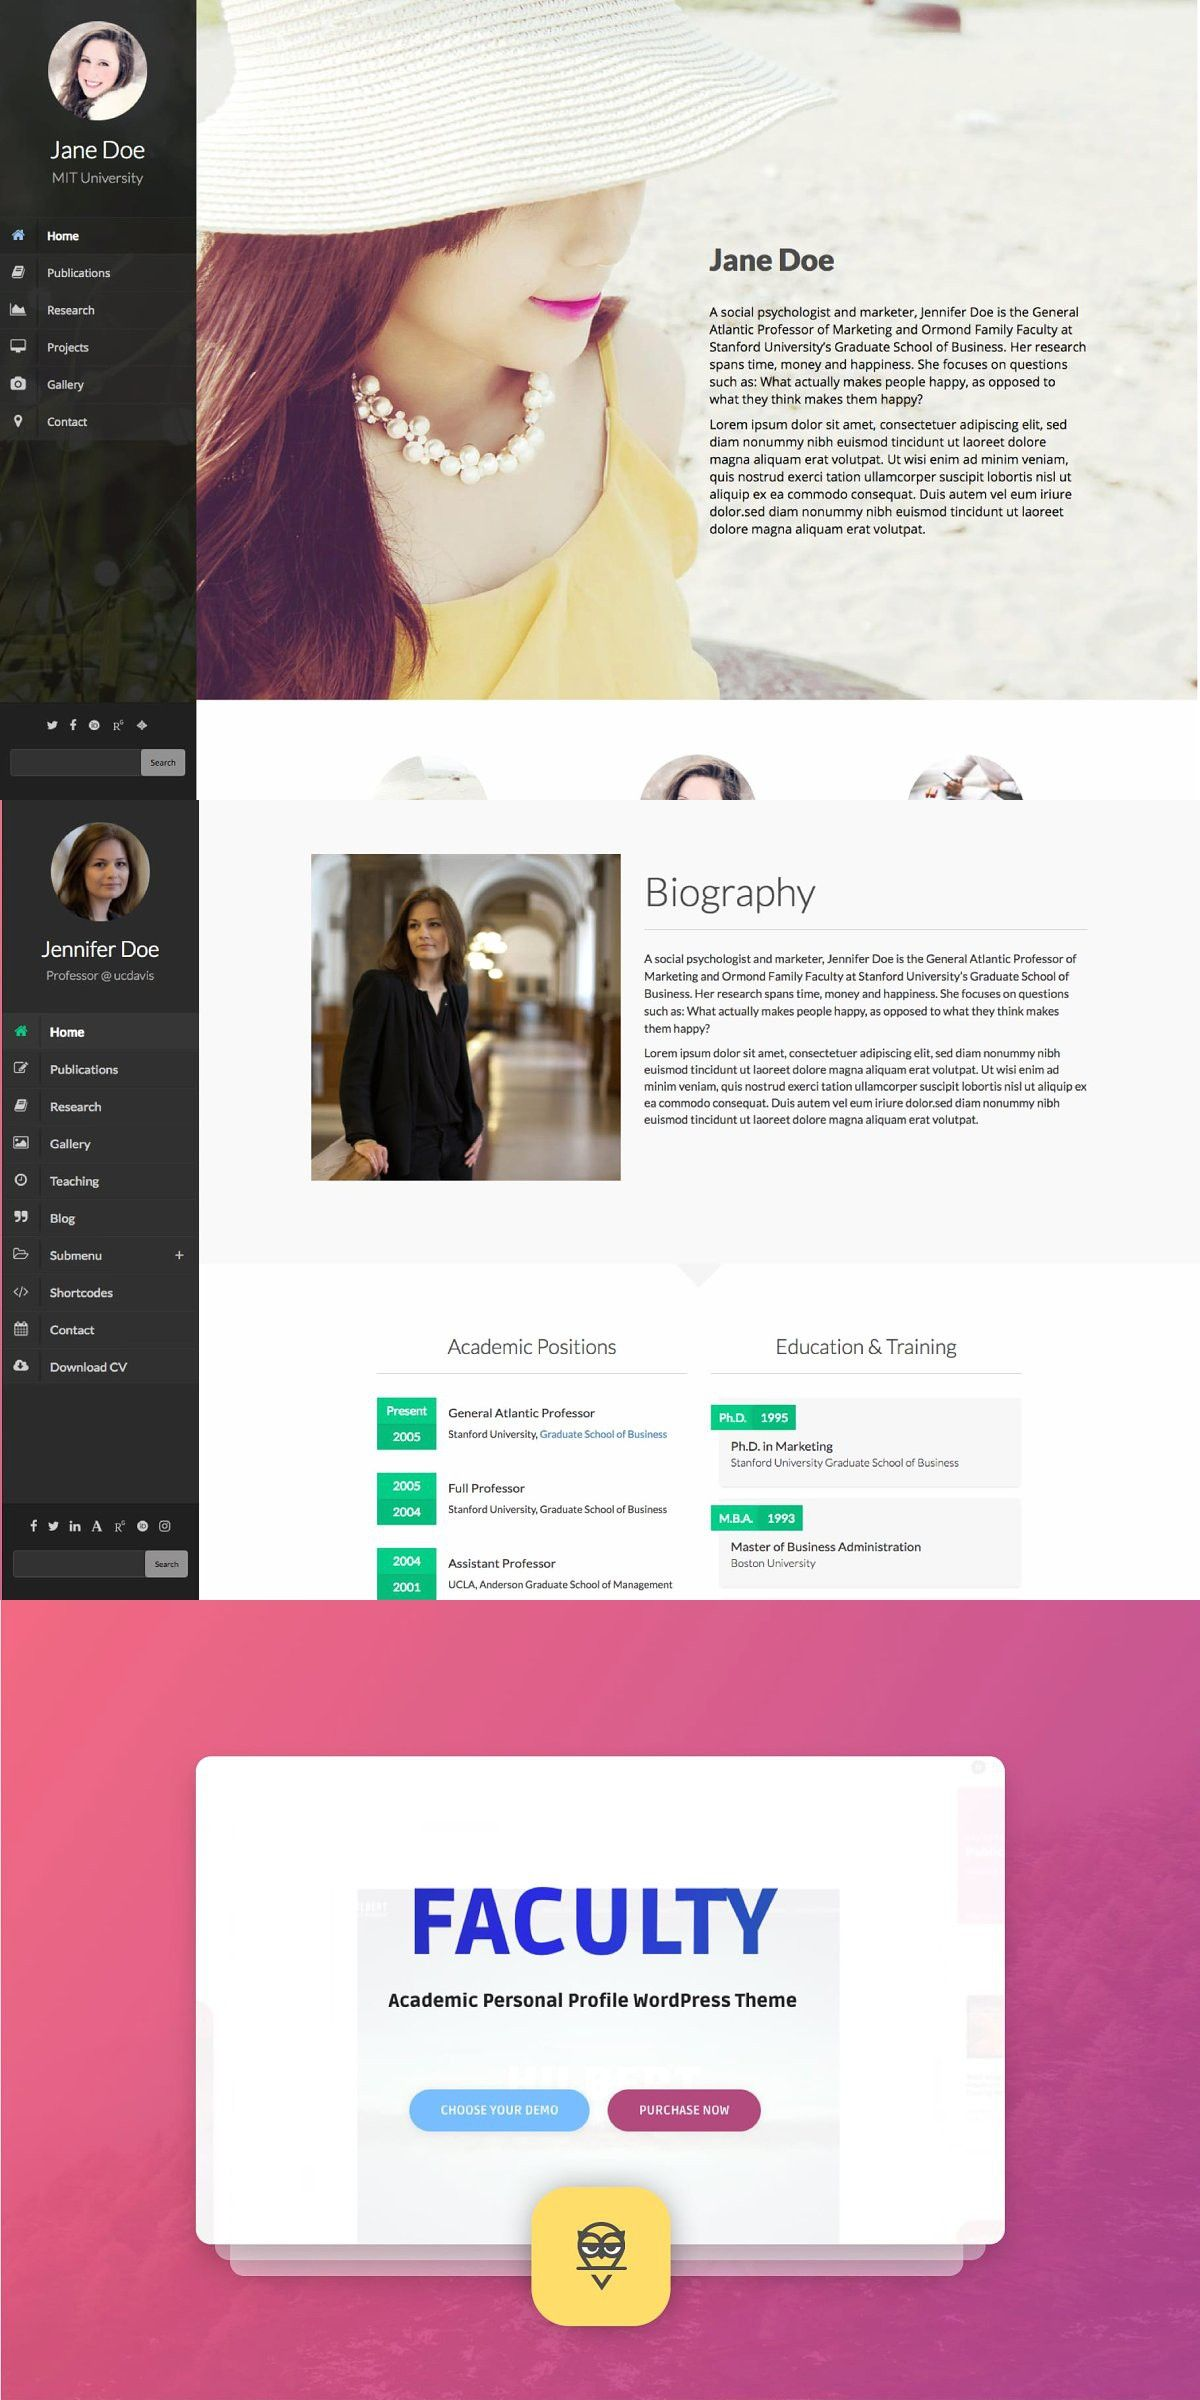 Faculty Wordpress Theme Pretty Web Design Wordpress Theme Faculties